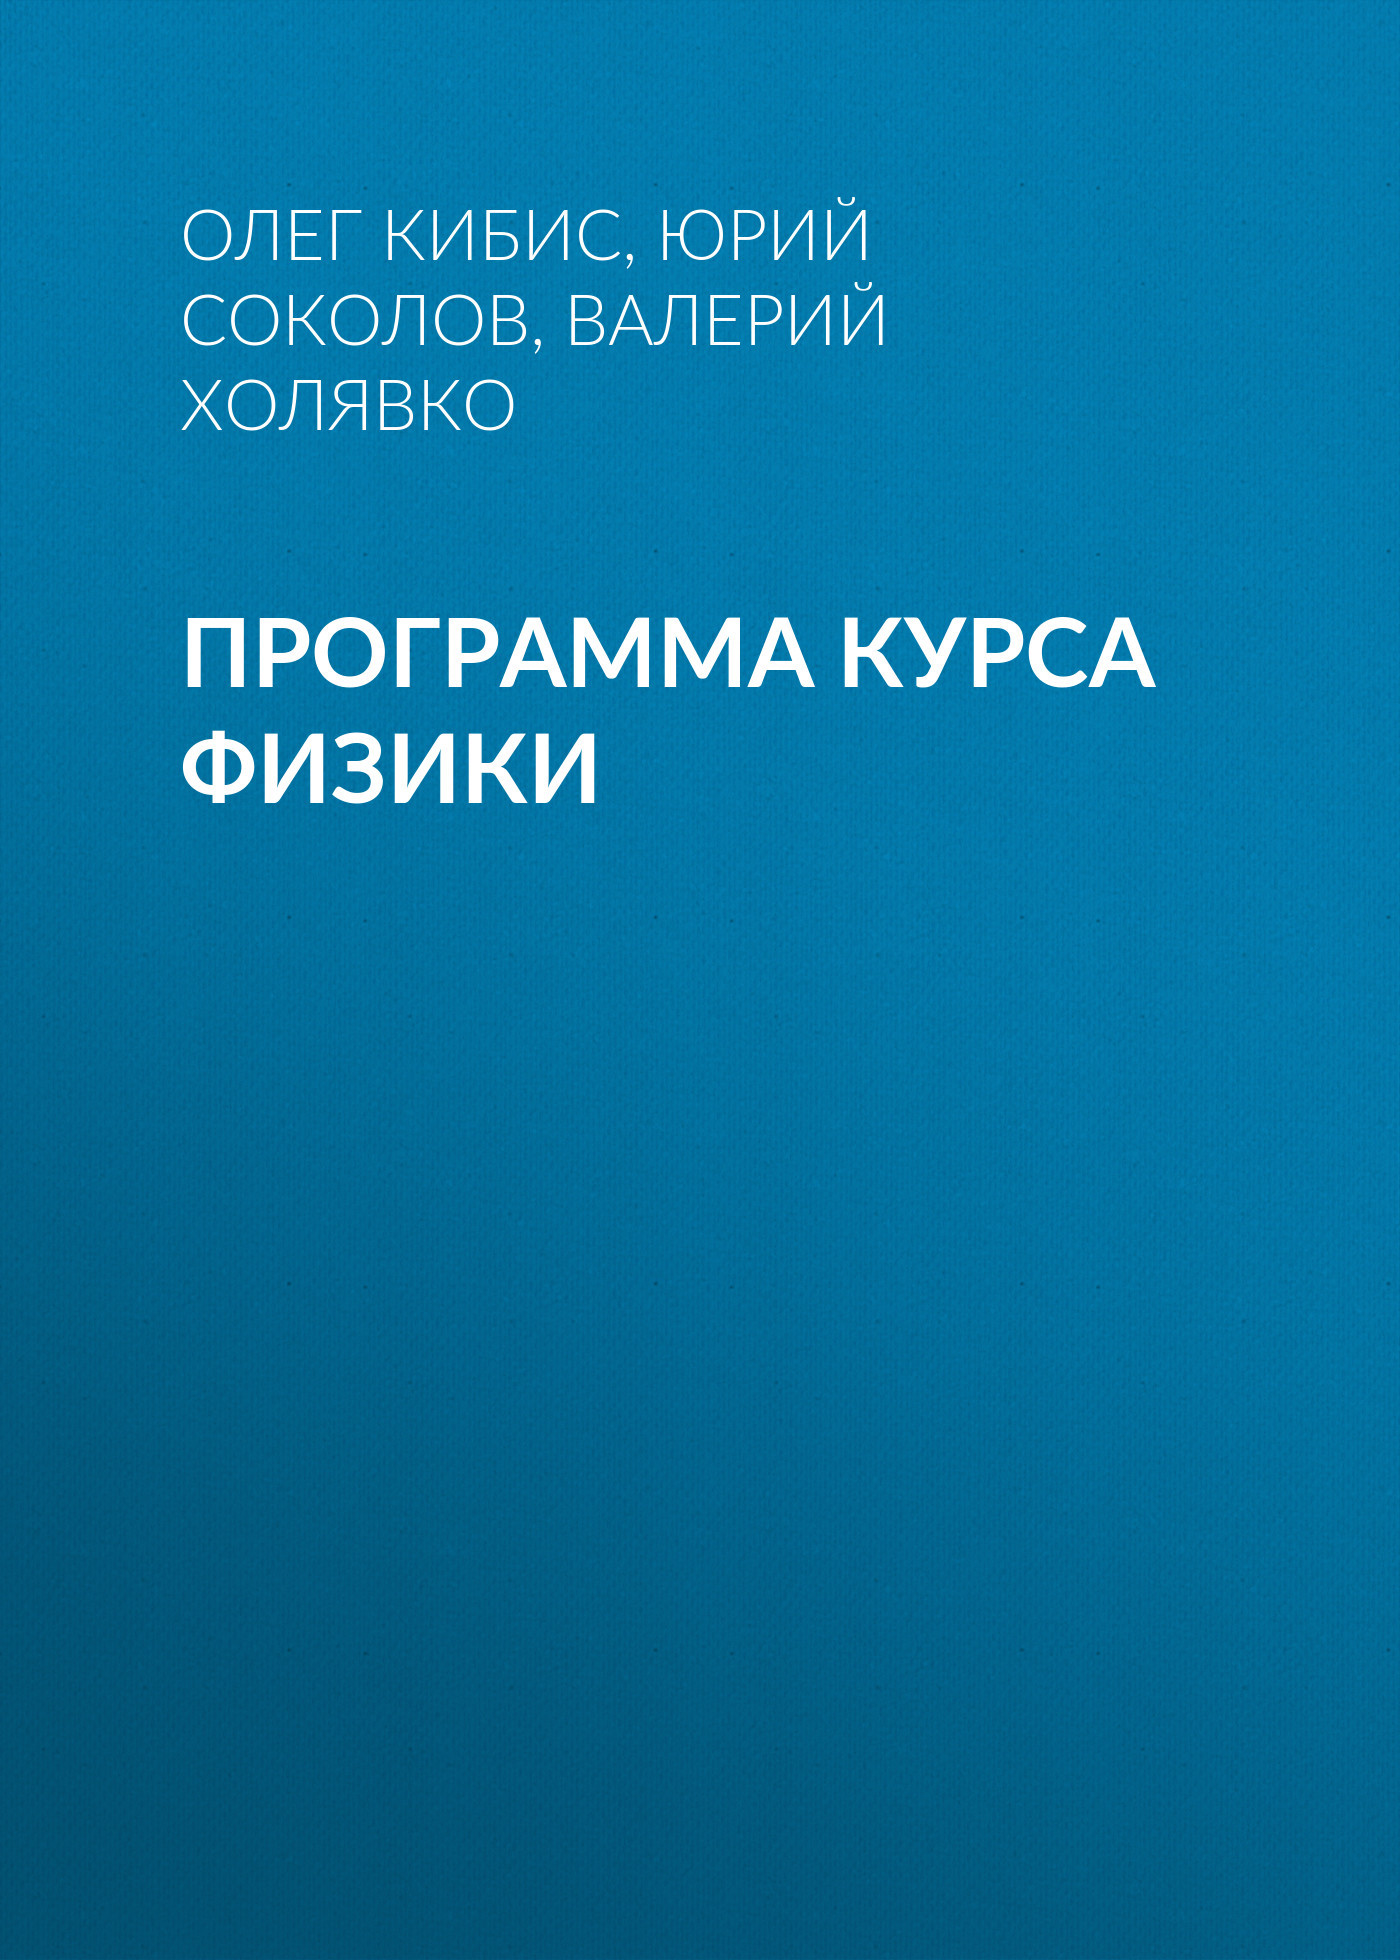 Юрий Соколов Программа курса физики наноэлектроника учебное пособие